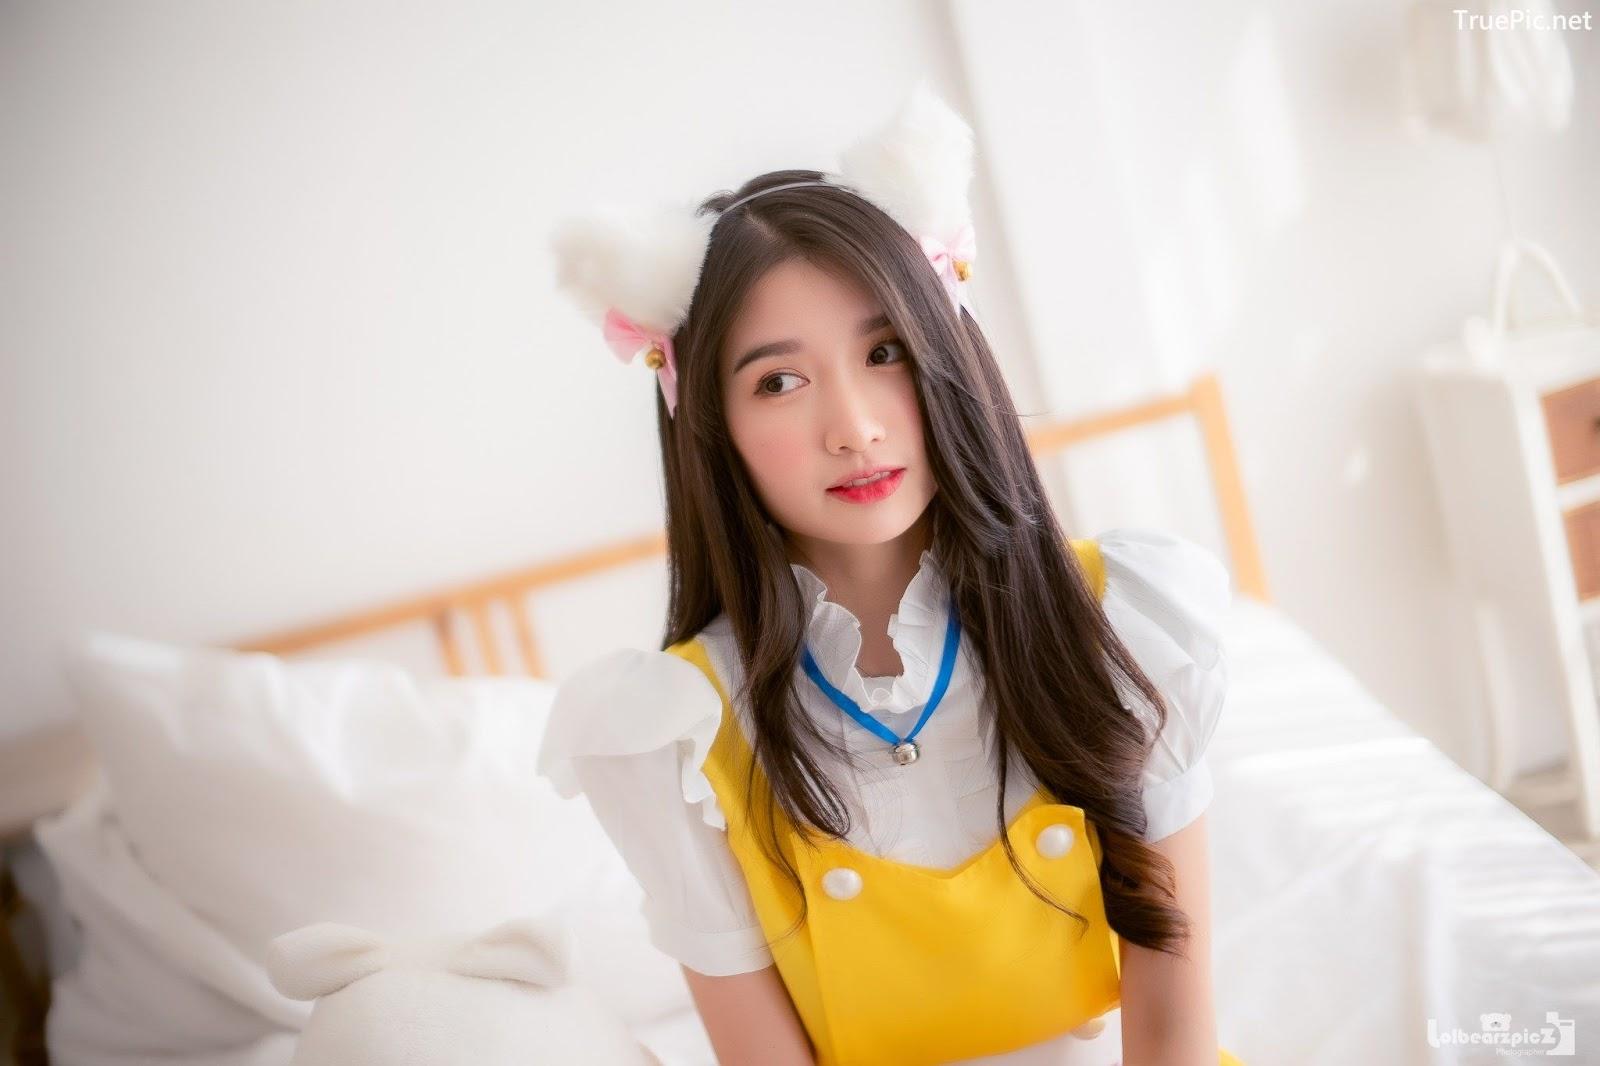 Image Thailand Model - Yatawee Limsiripothong - Cute Maid - TruePic.net - Picture-2